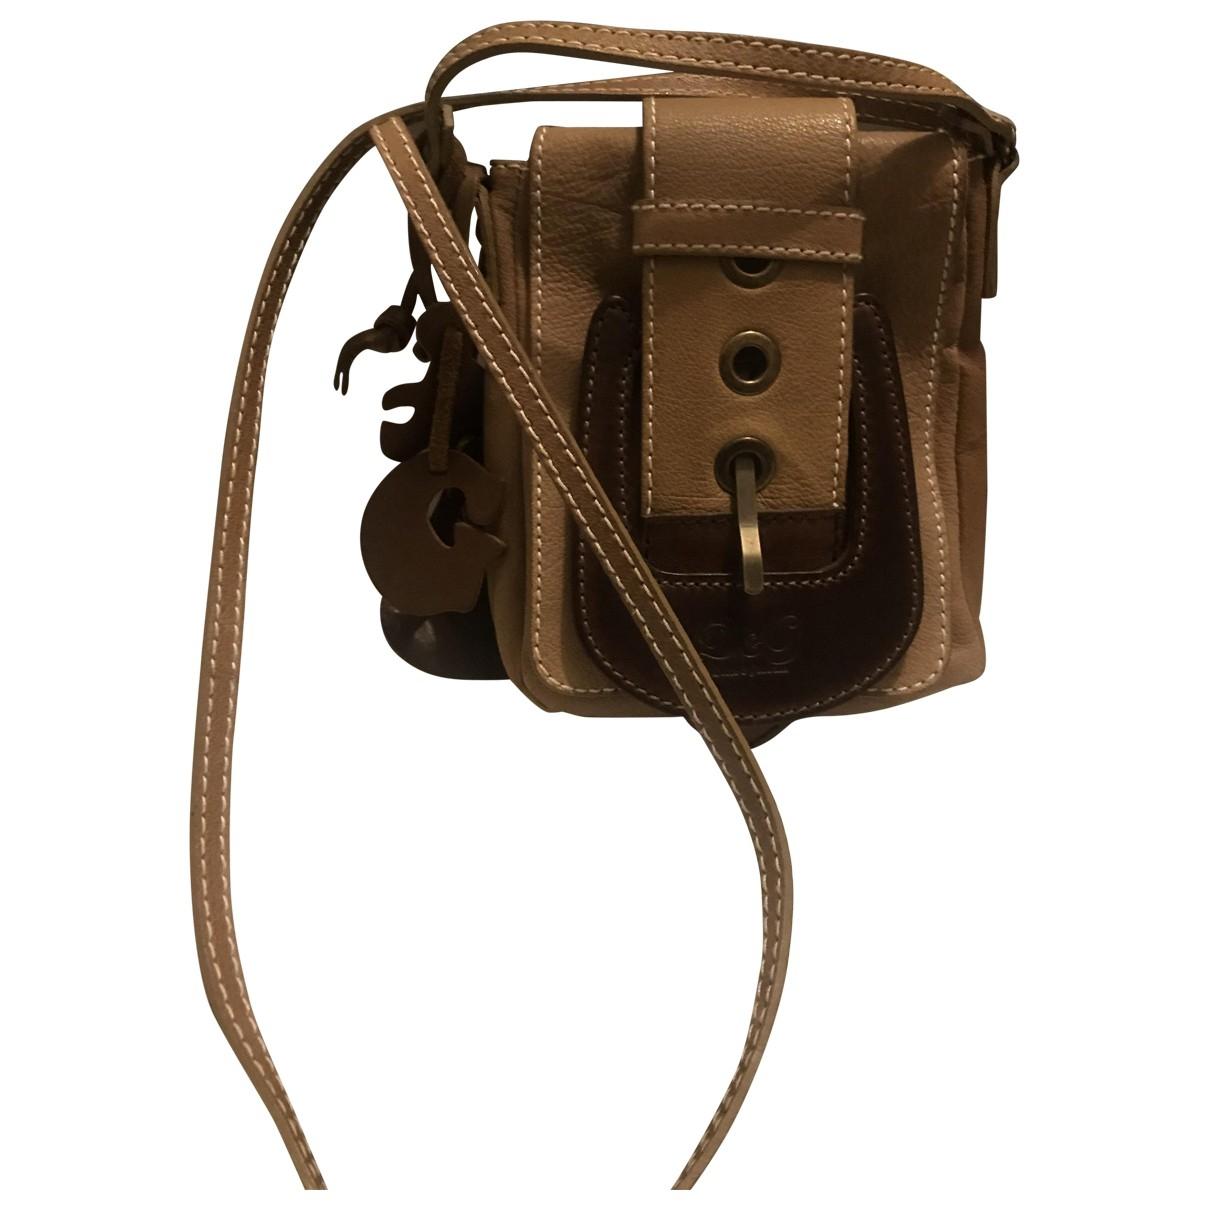 D&g \N Beige Leather Clutch bag for Women \N